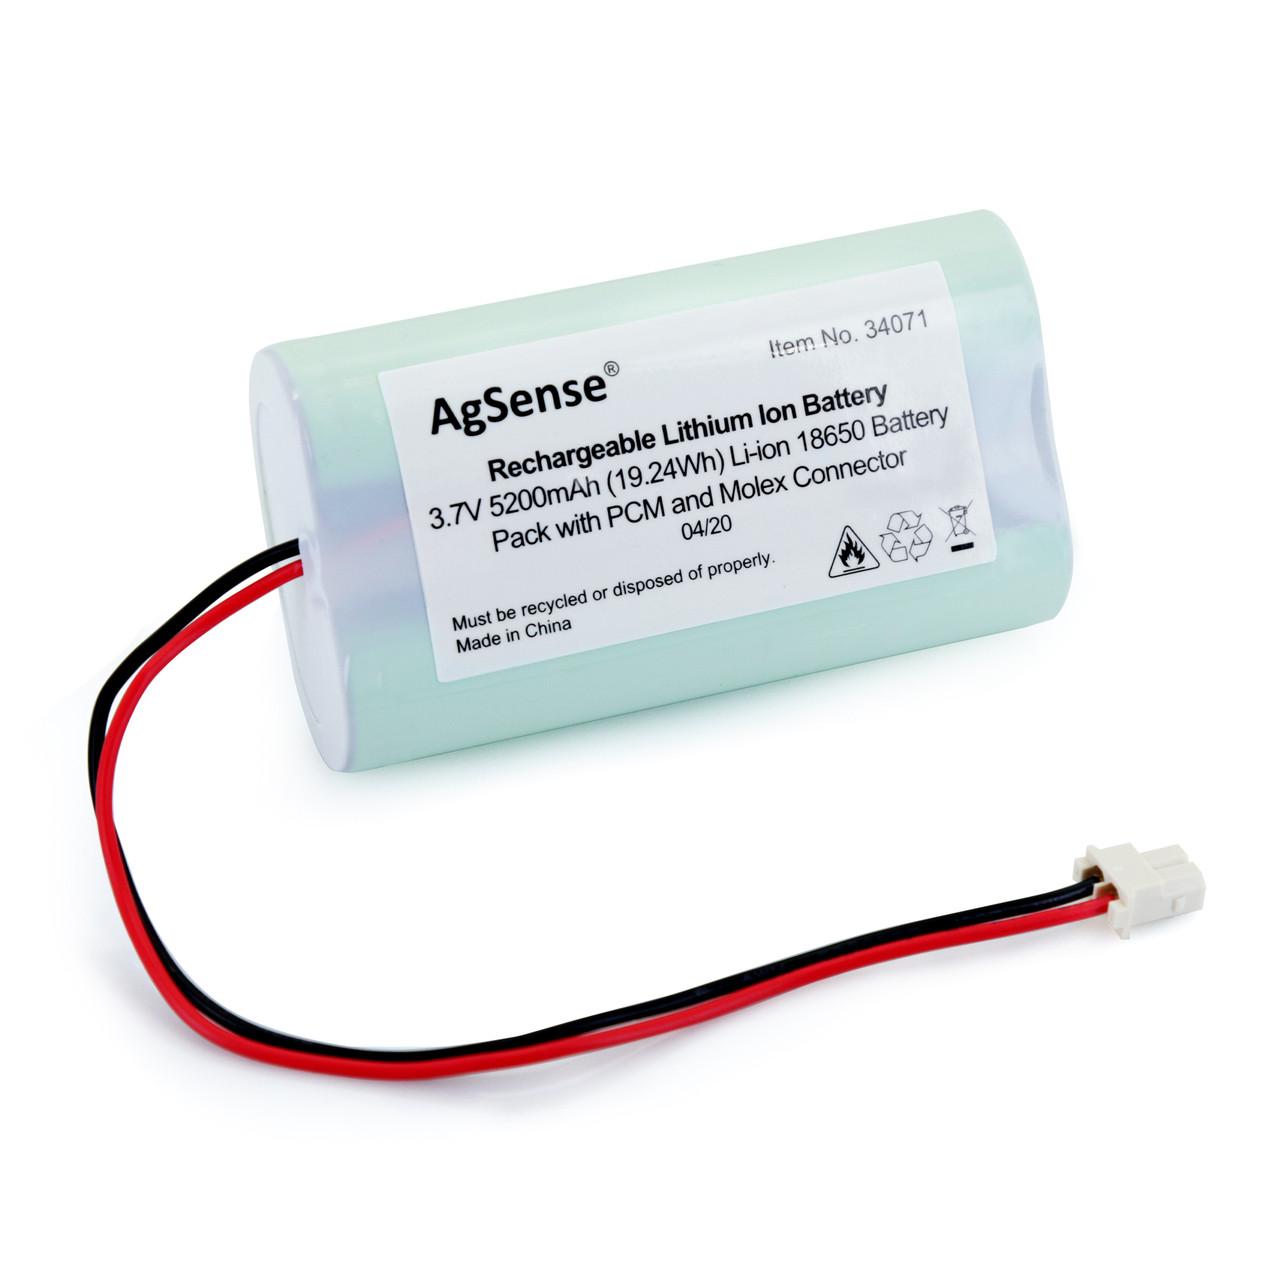 Li-Ion 3.7V 5200mAh Rechargeable Battery w/ PCM (1S2P, 19.24Wh, 6A Rate, w/ Molex Connector)